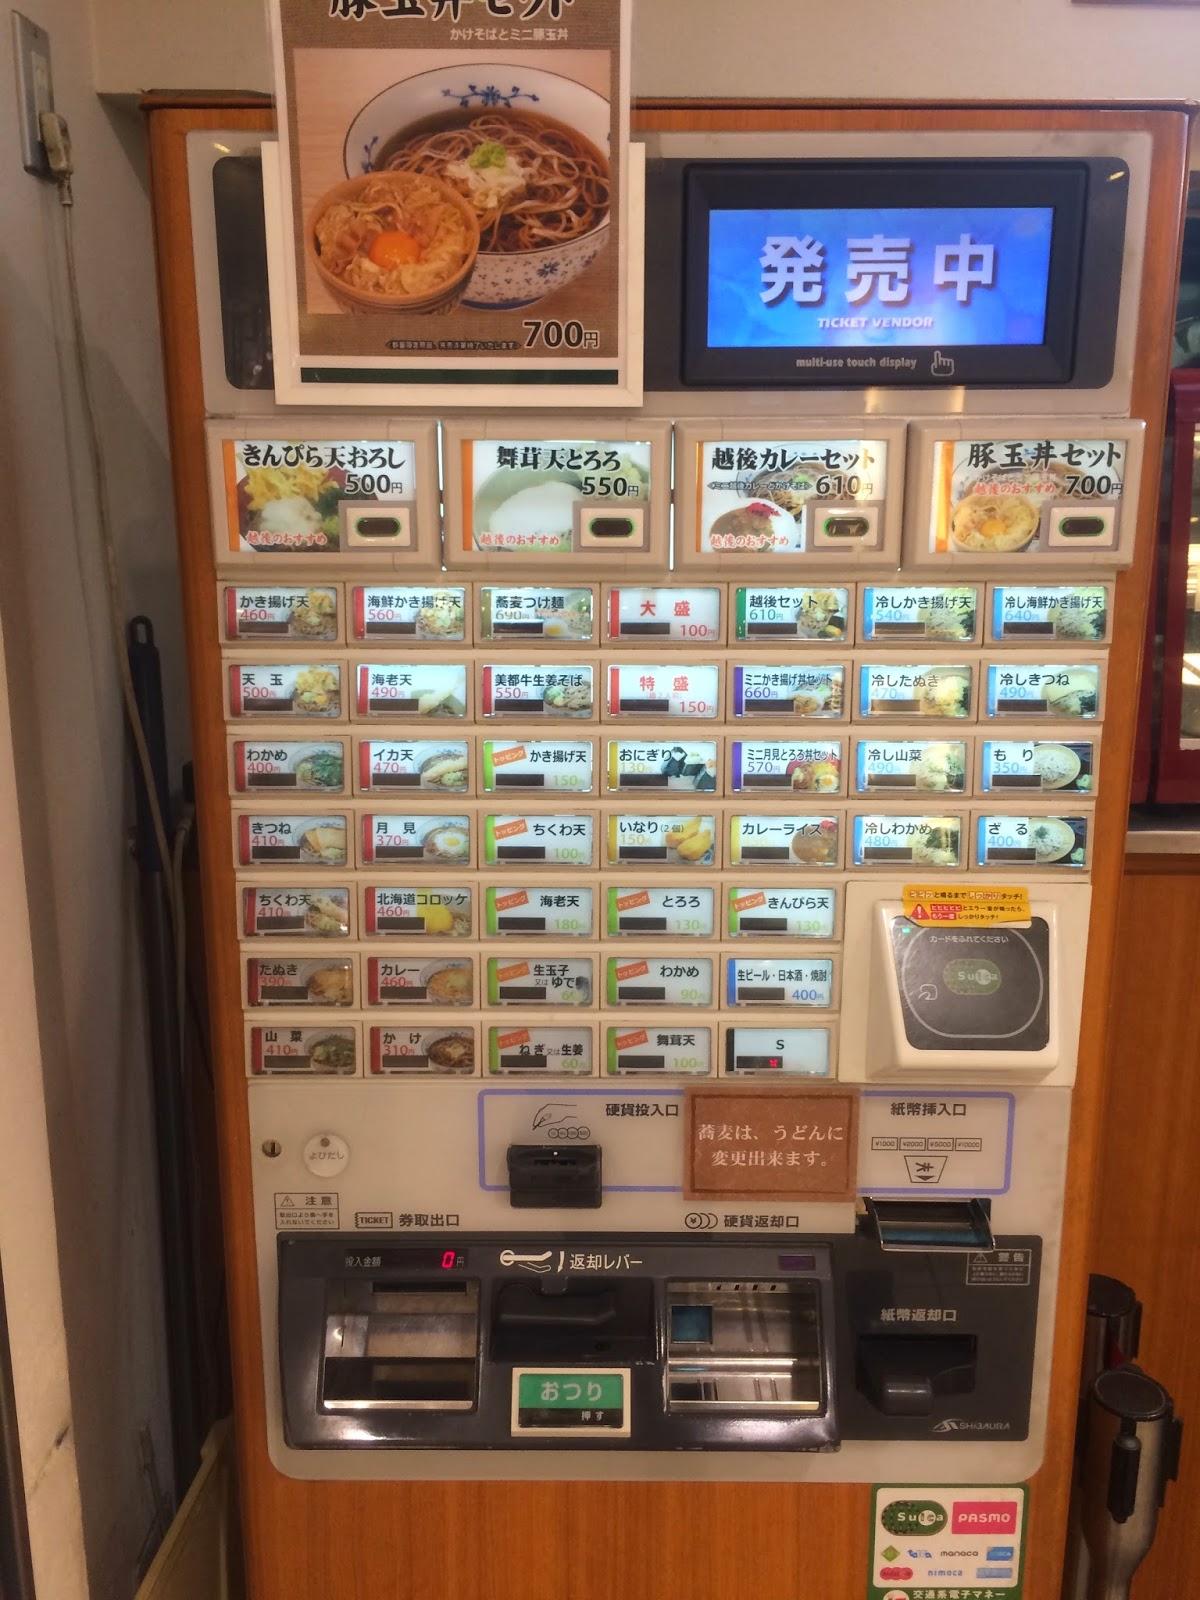 Dating Myself: The Tokyo Metro Japanese Ramen Vending ...